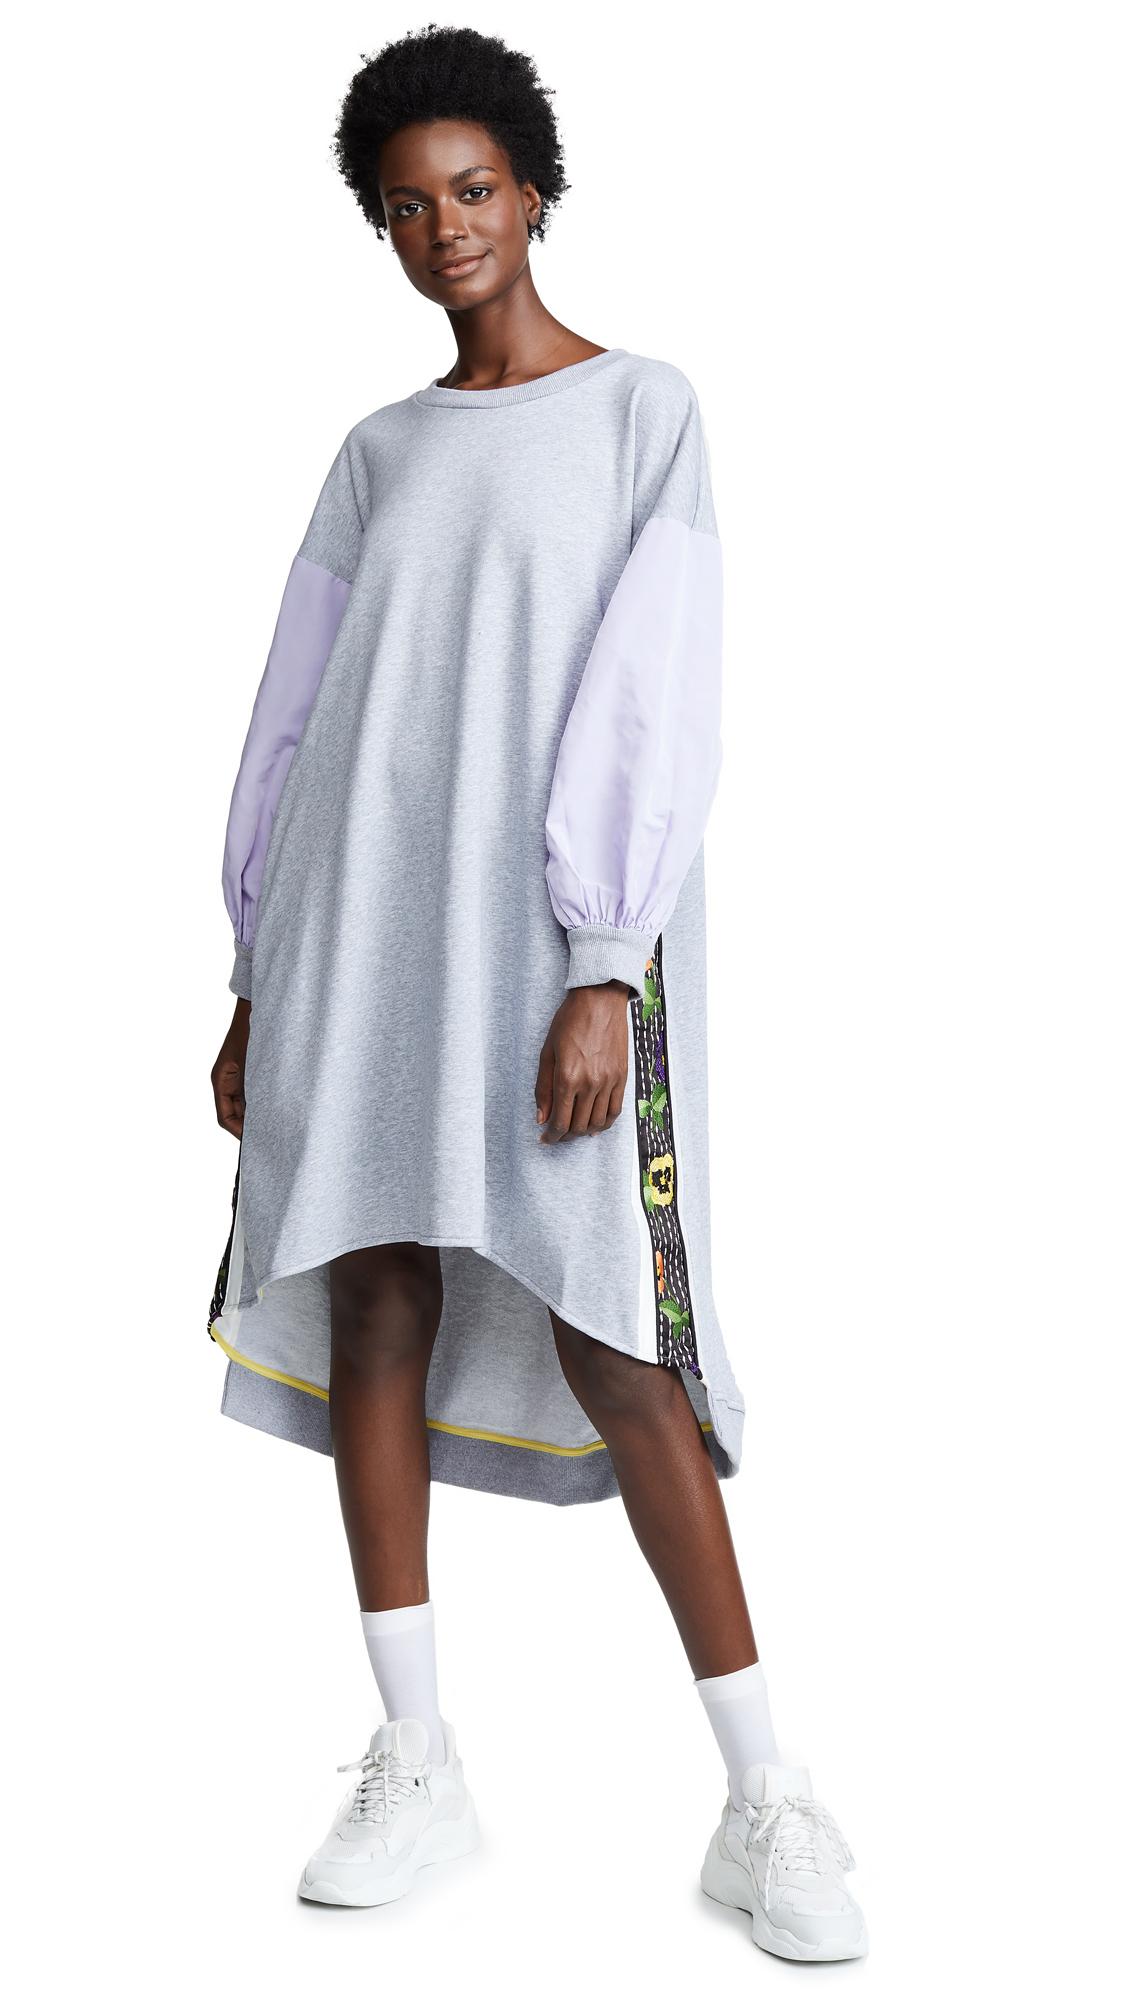 ZAYAN THE LABEL Dai Dress in Grey